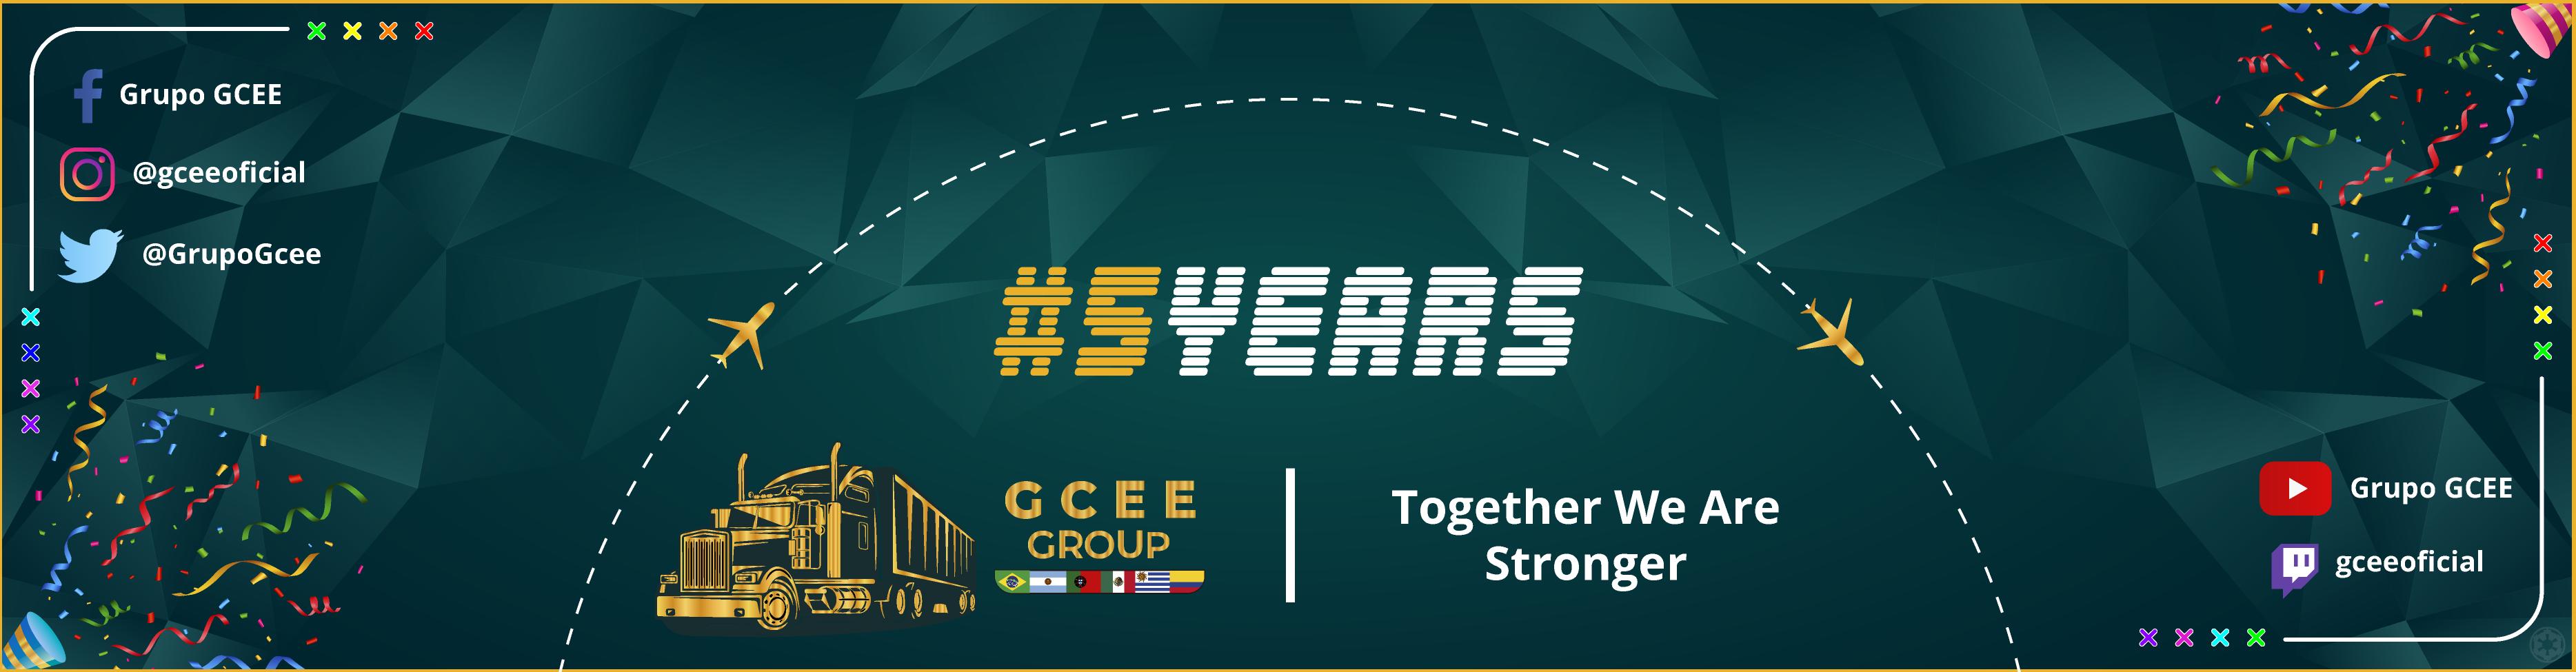 GCEE Latin-America | 5th Anniversary